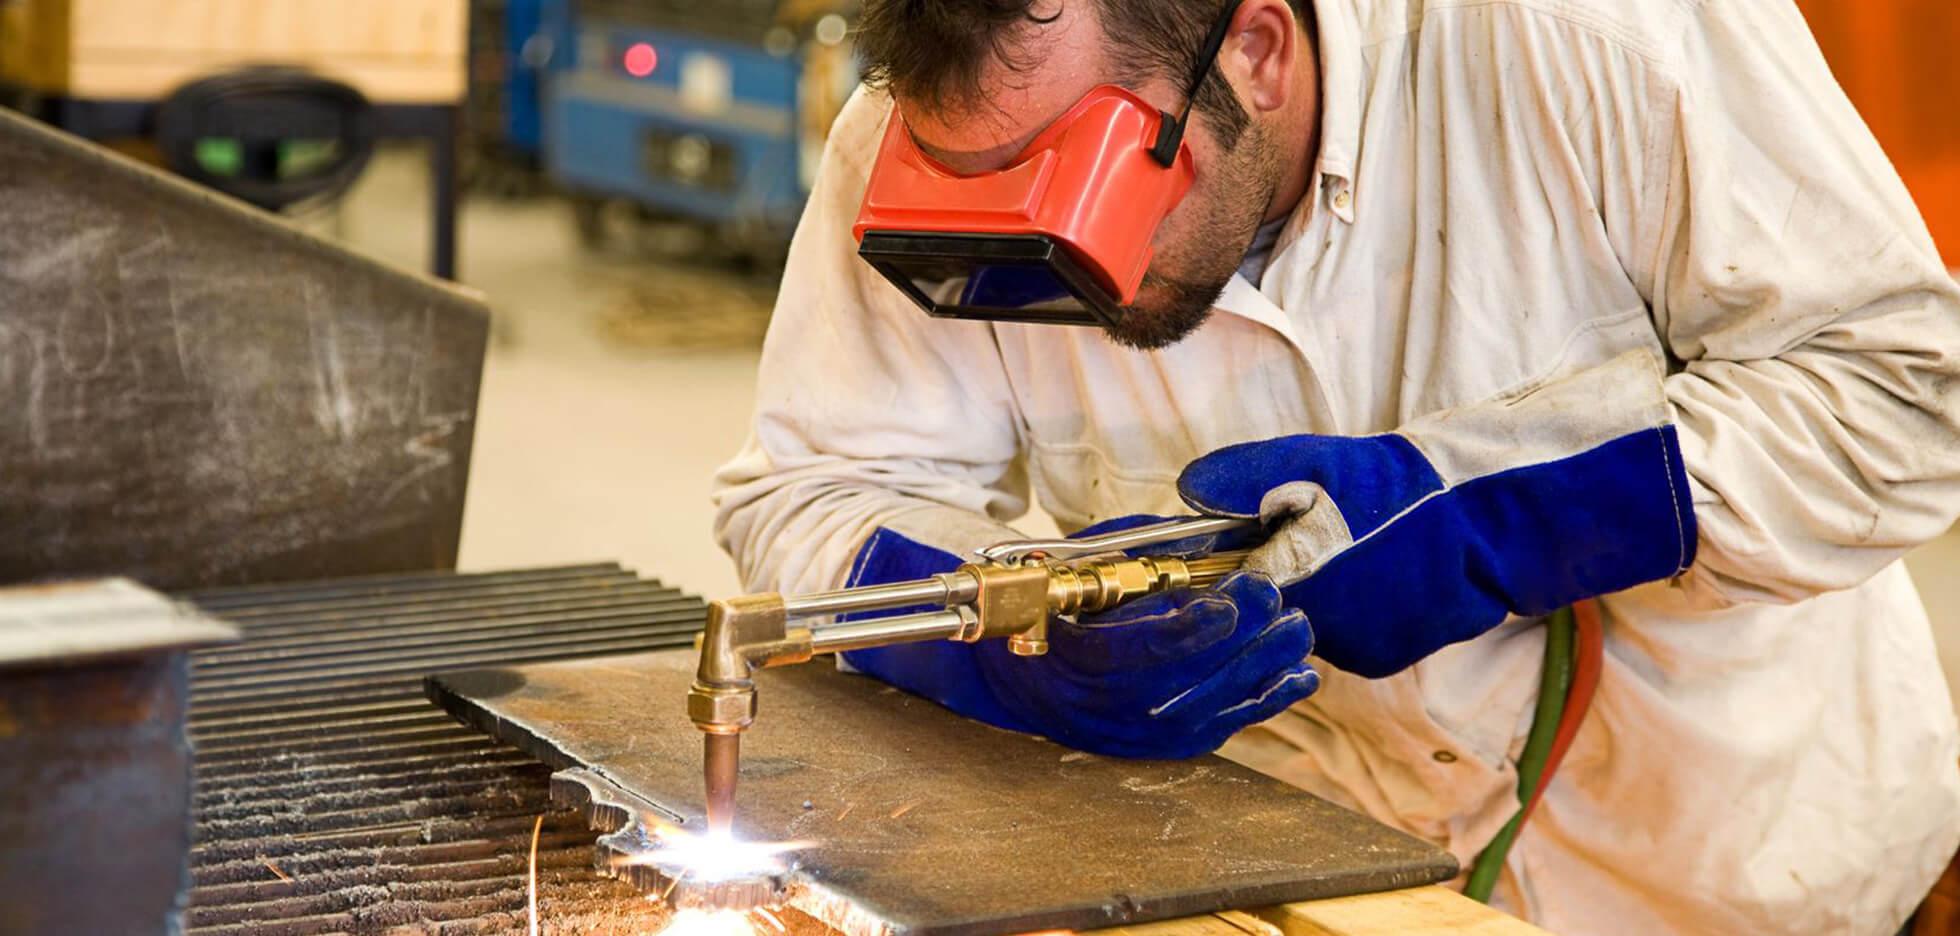 manufacturing-bg.jpg